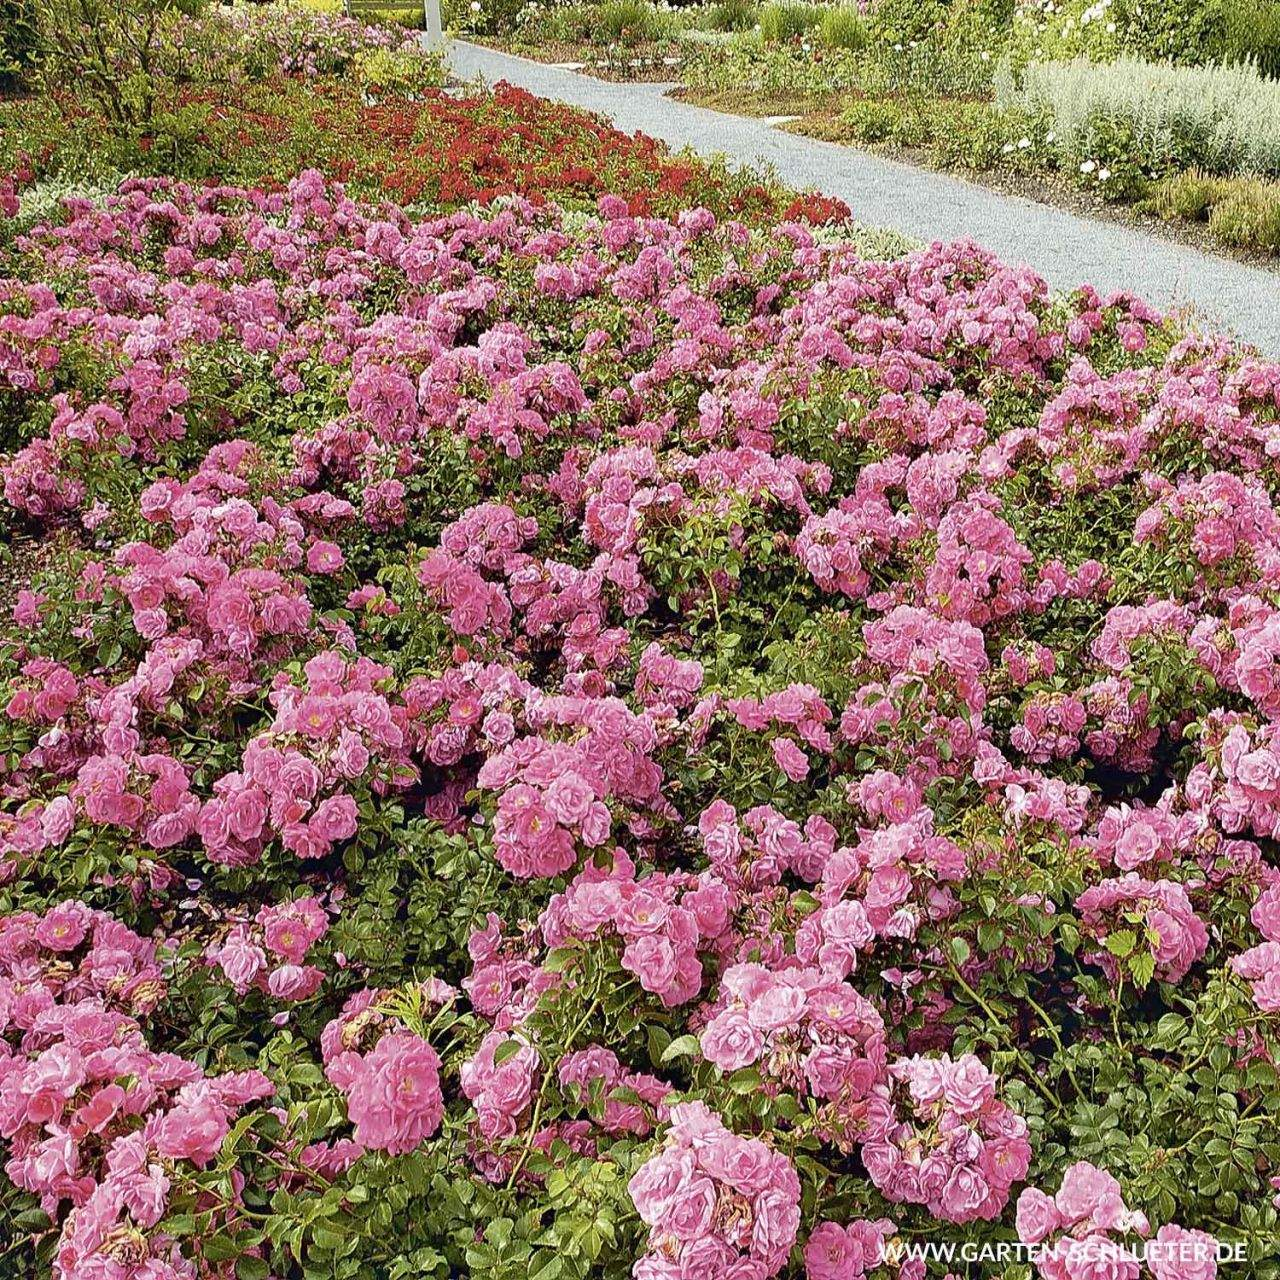 1 Bodendeckerrose Palmengarten Frankfurt ADR Rose Rosa Palmengarten Frankfurt 1280x1280